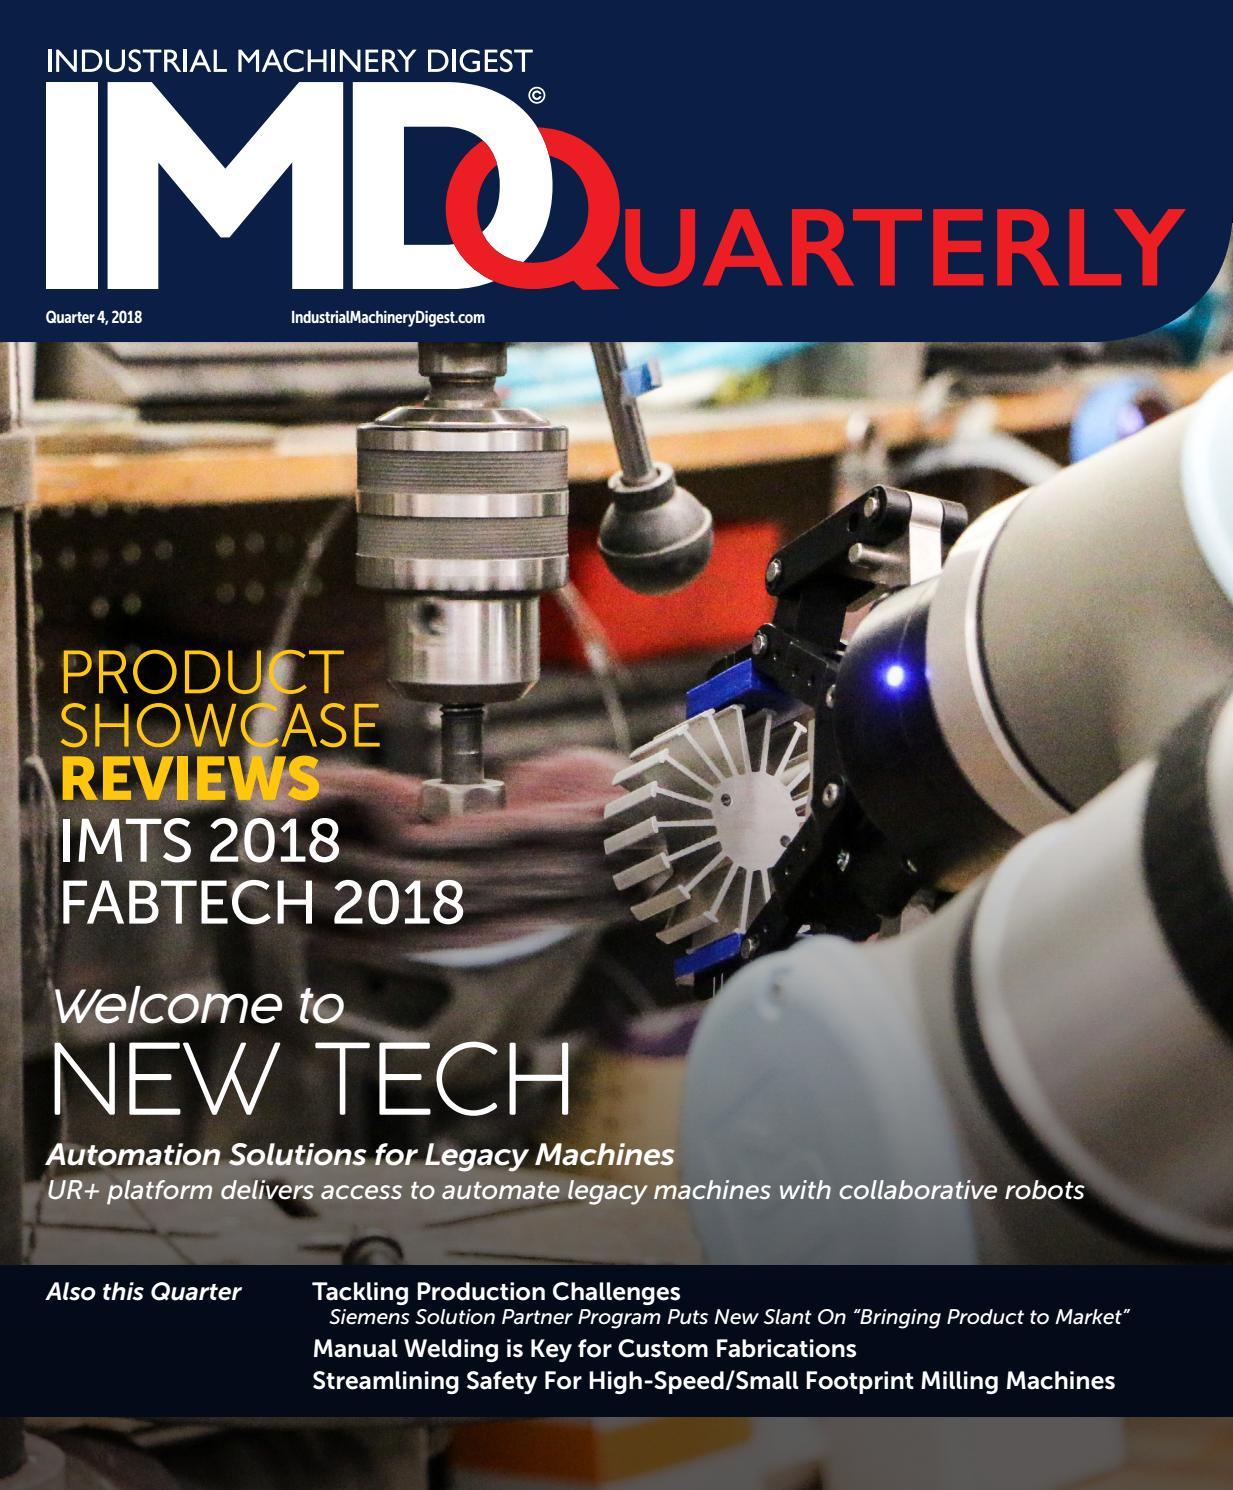 Industrial Machinery Digest Quarterly - IMD Quarter 4, 2018